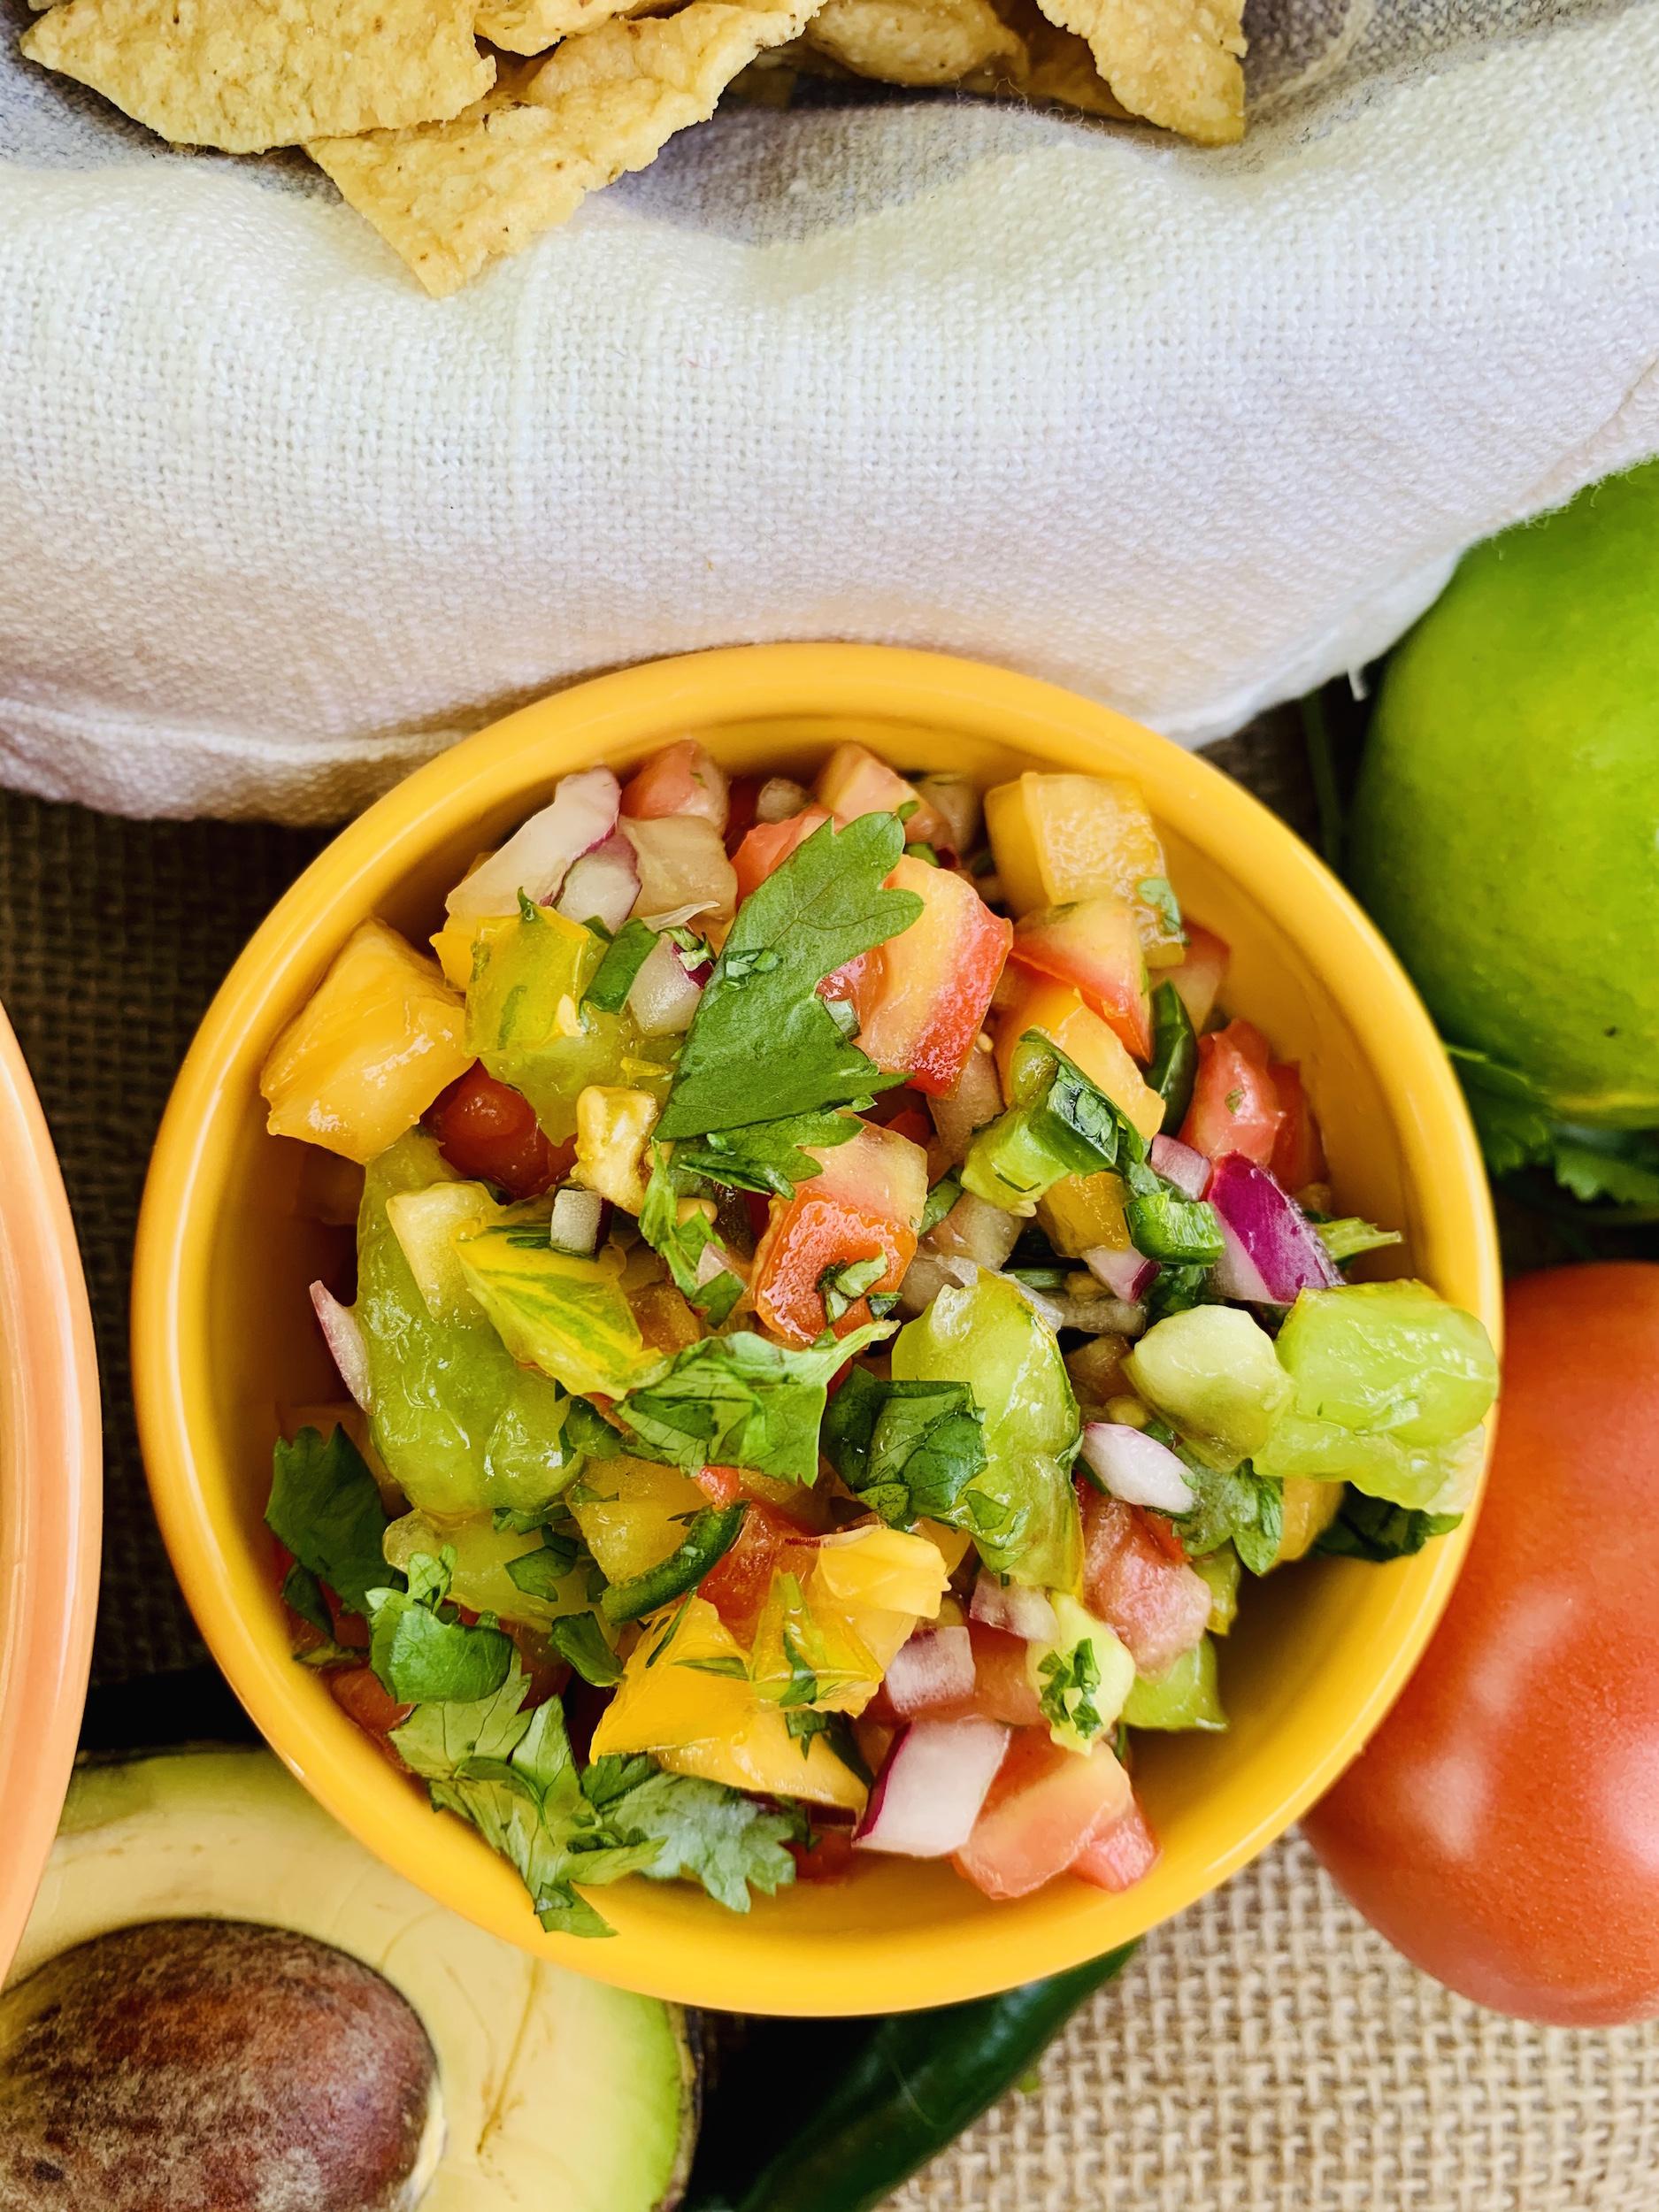 Bowl of fresh pico de gallo with tomatoes, onion, cilantro and lime